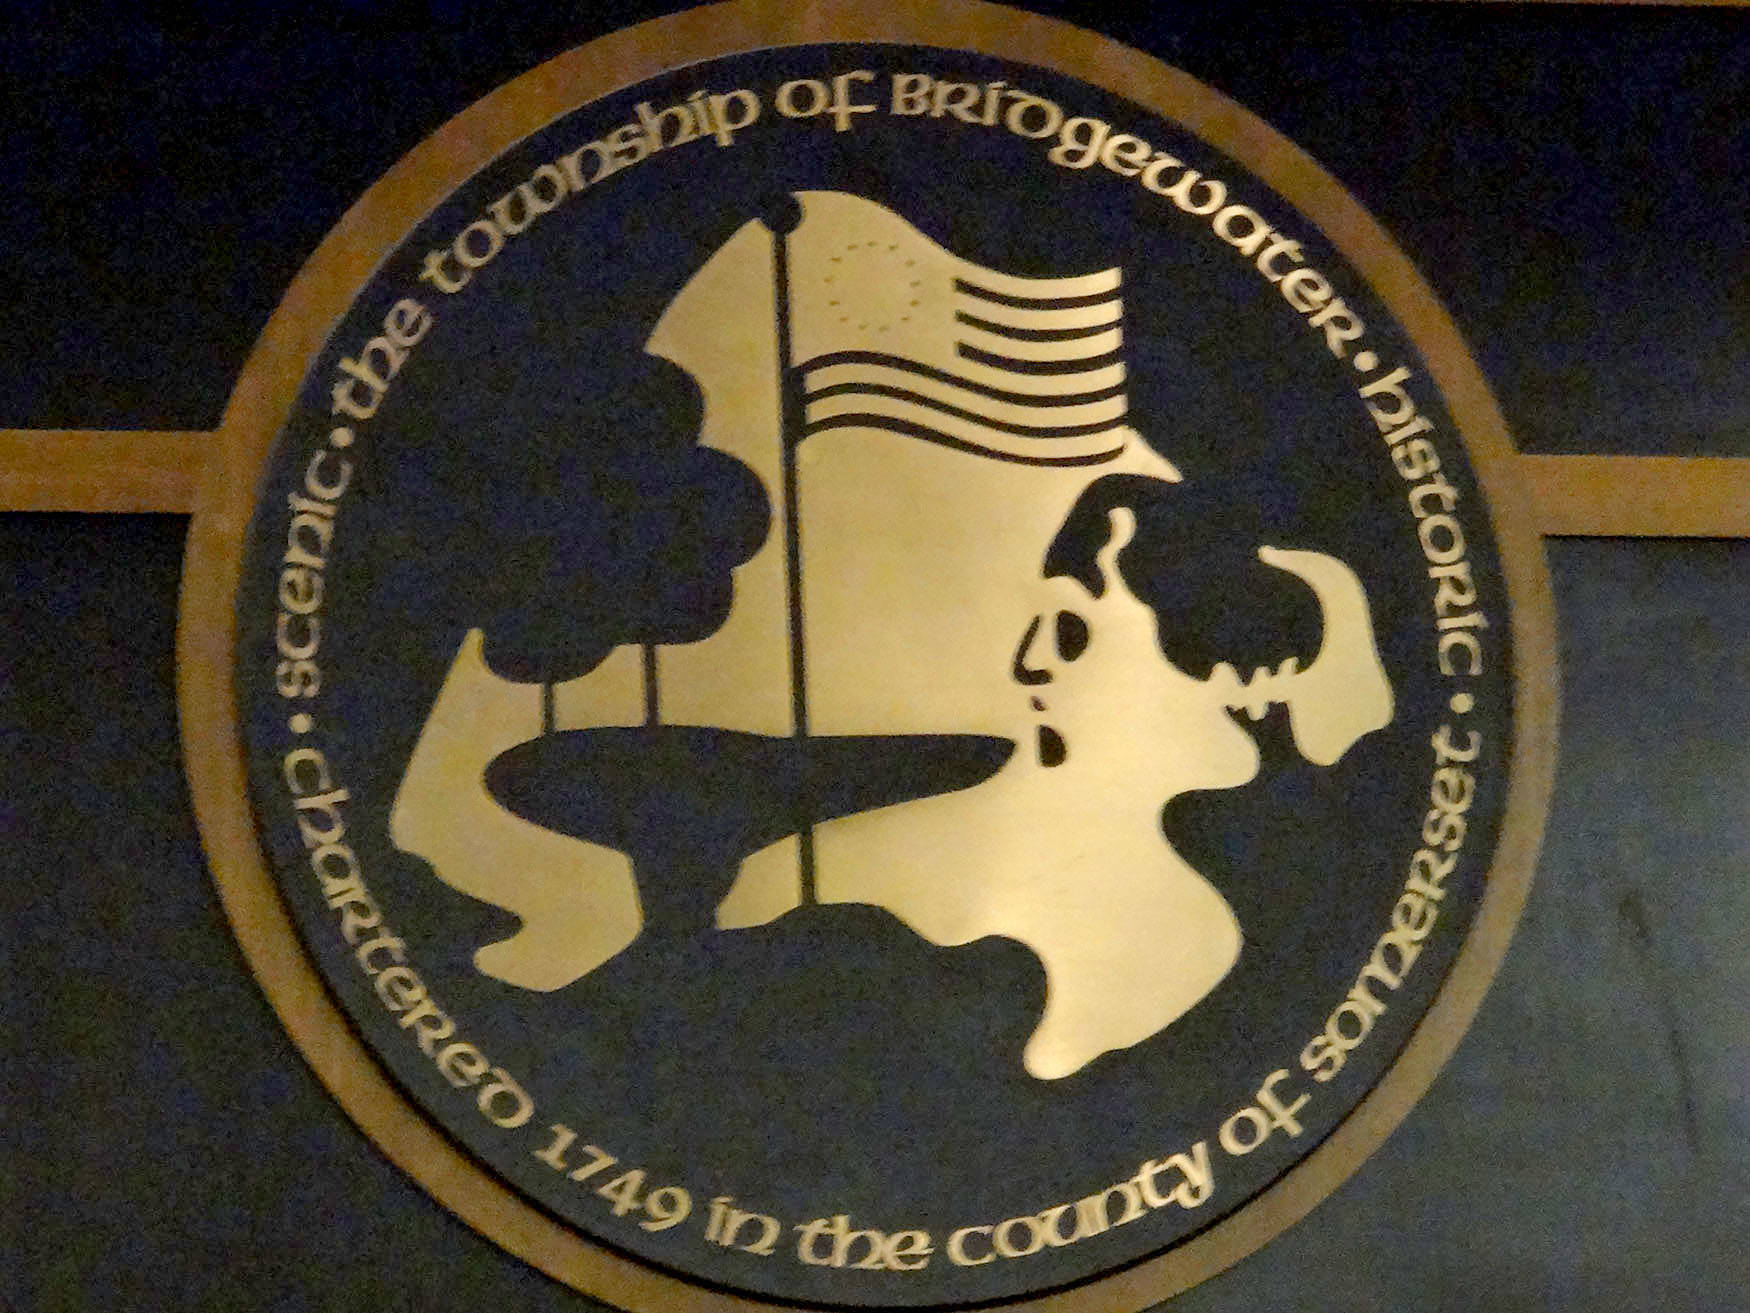 cd5fb600e85c2e7fd4d8_Bridgewater_symbol.jpg